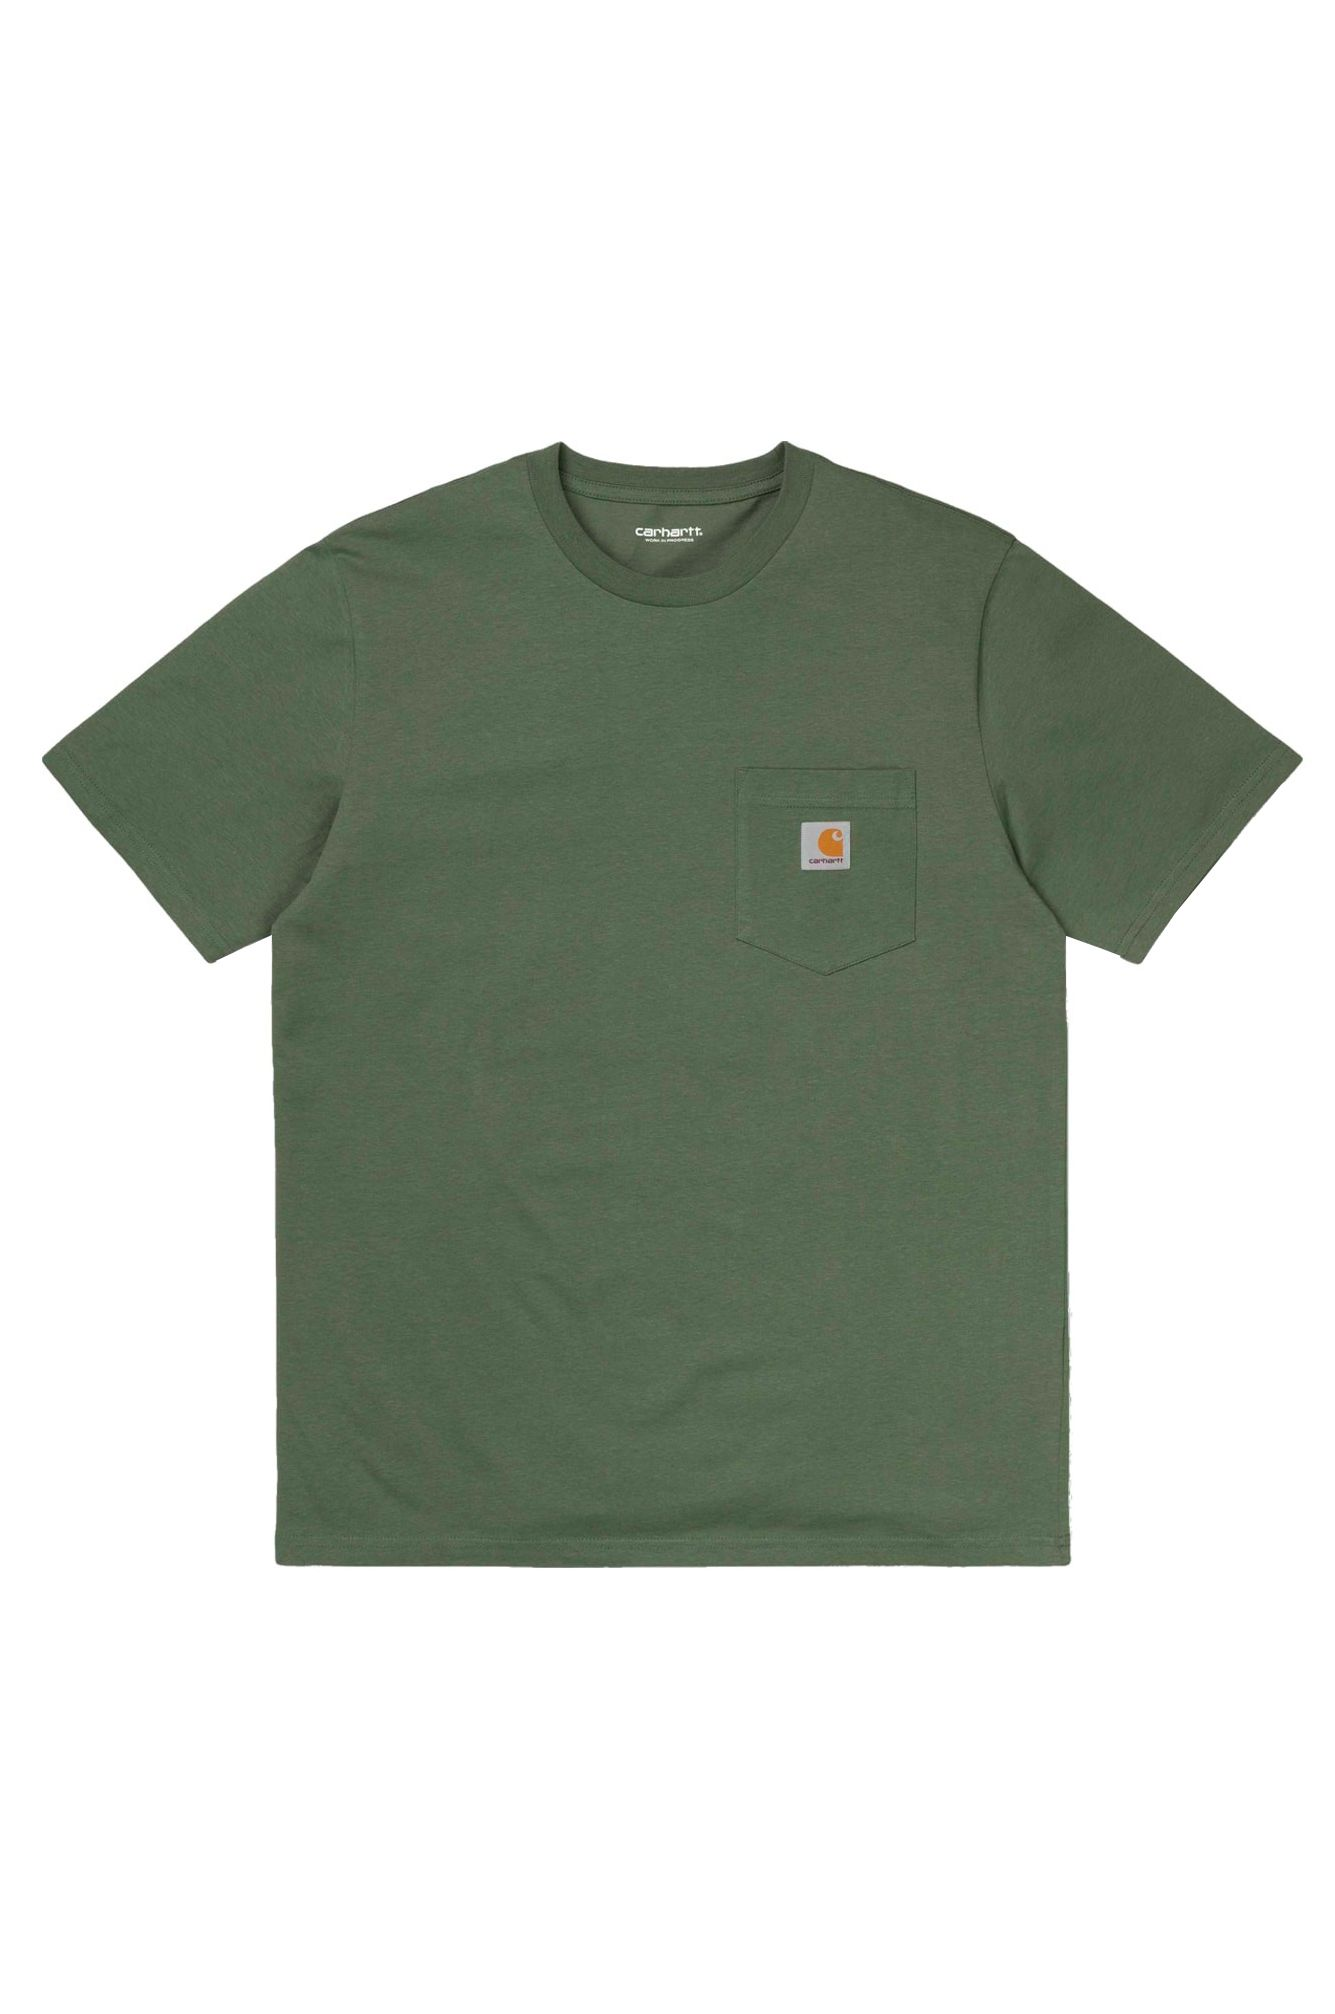 T-Shirt Carhartt WIP S/S POCKET T-SHIRT Dollar Green